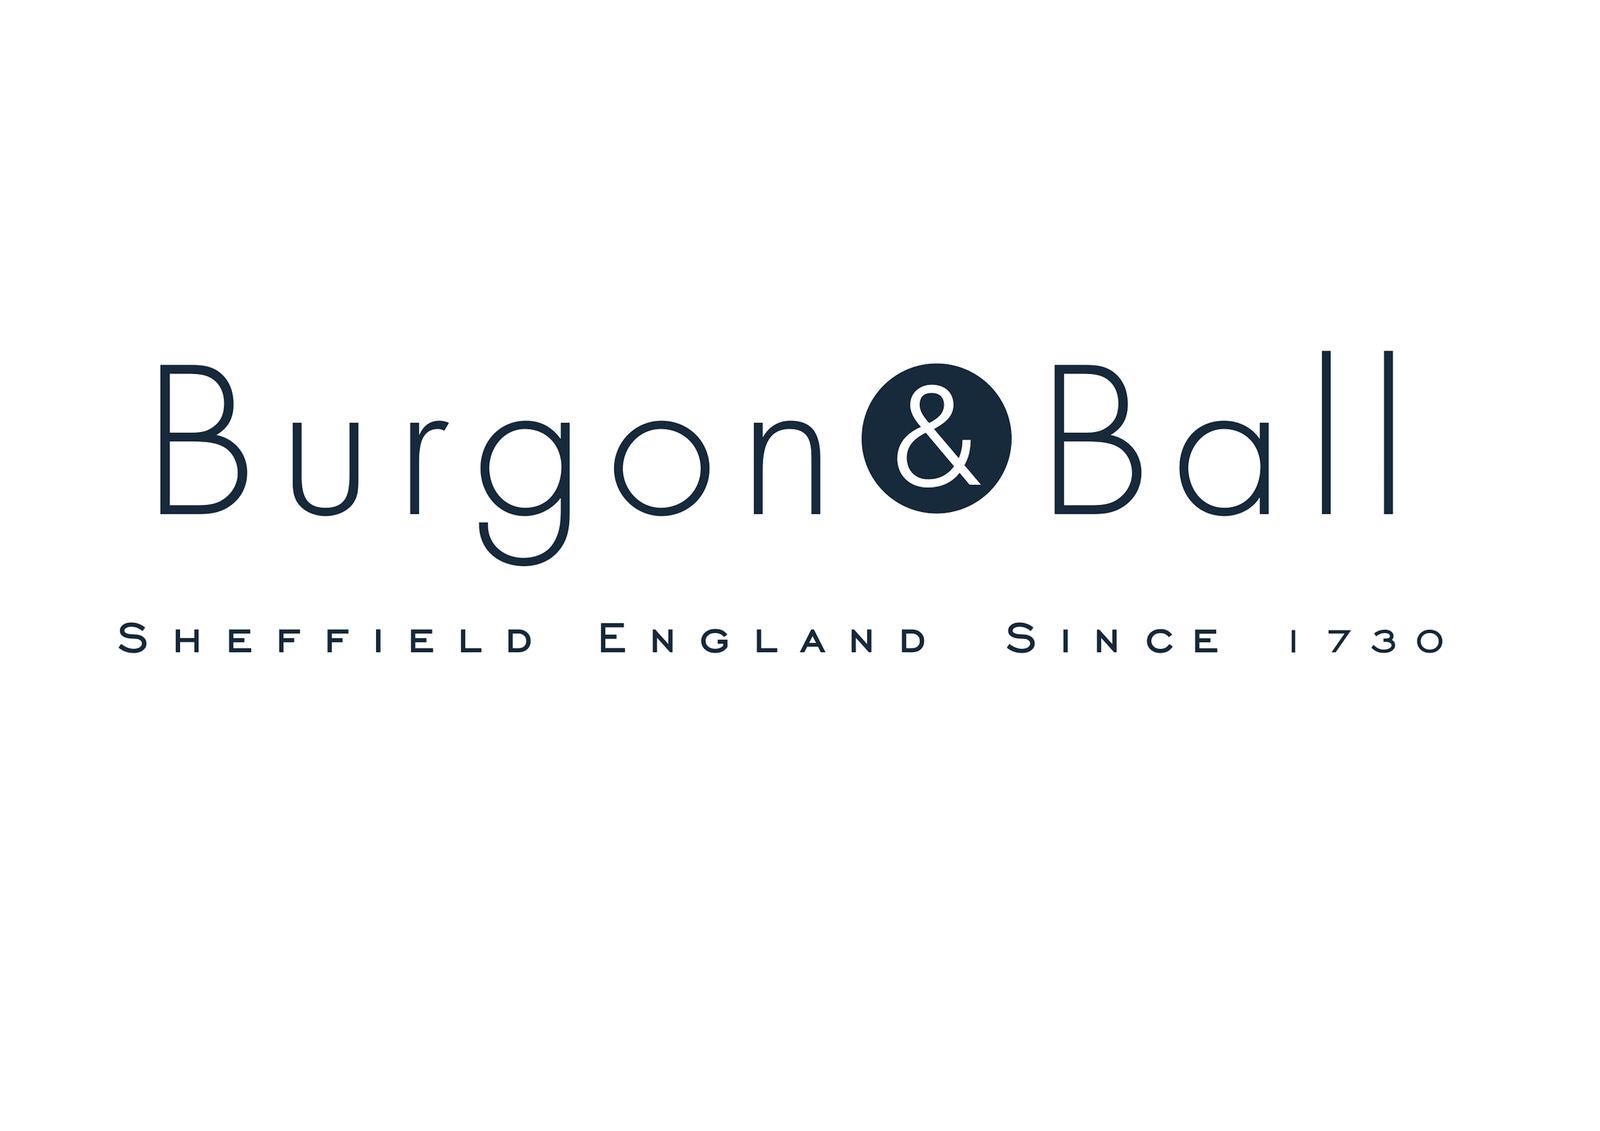 BB logo with since 1730 agri 2017.jpg